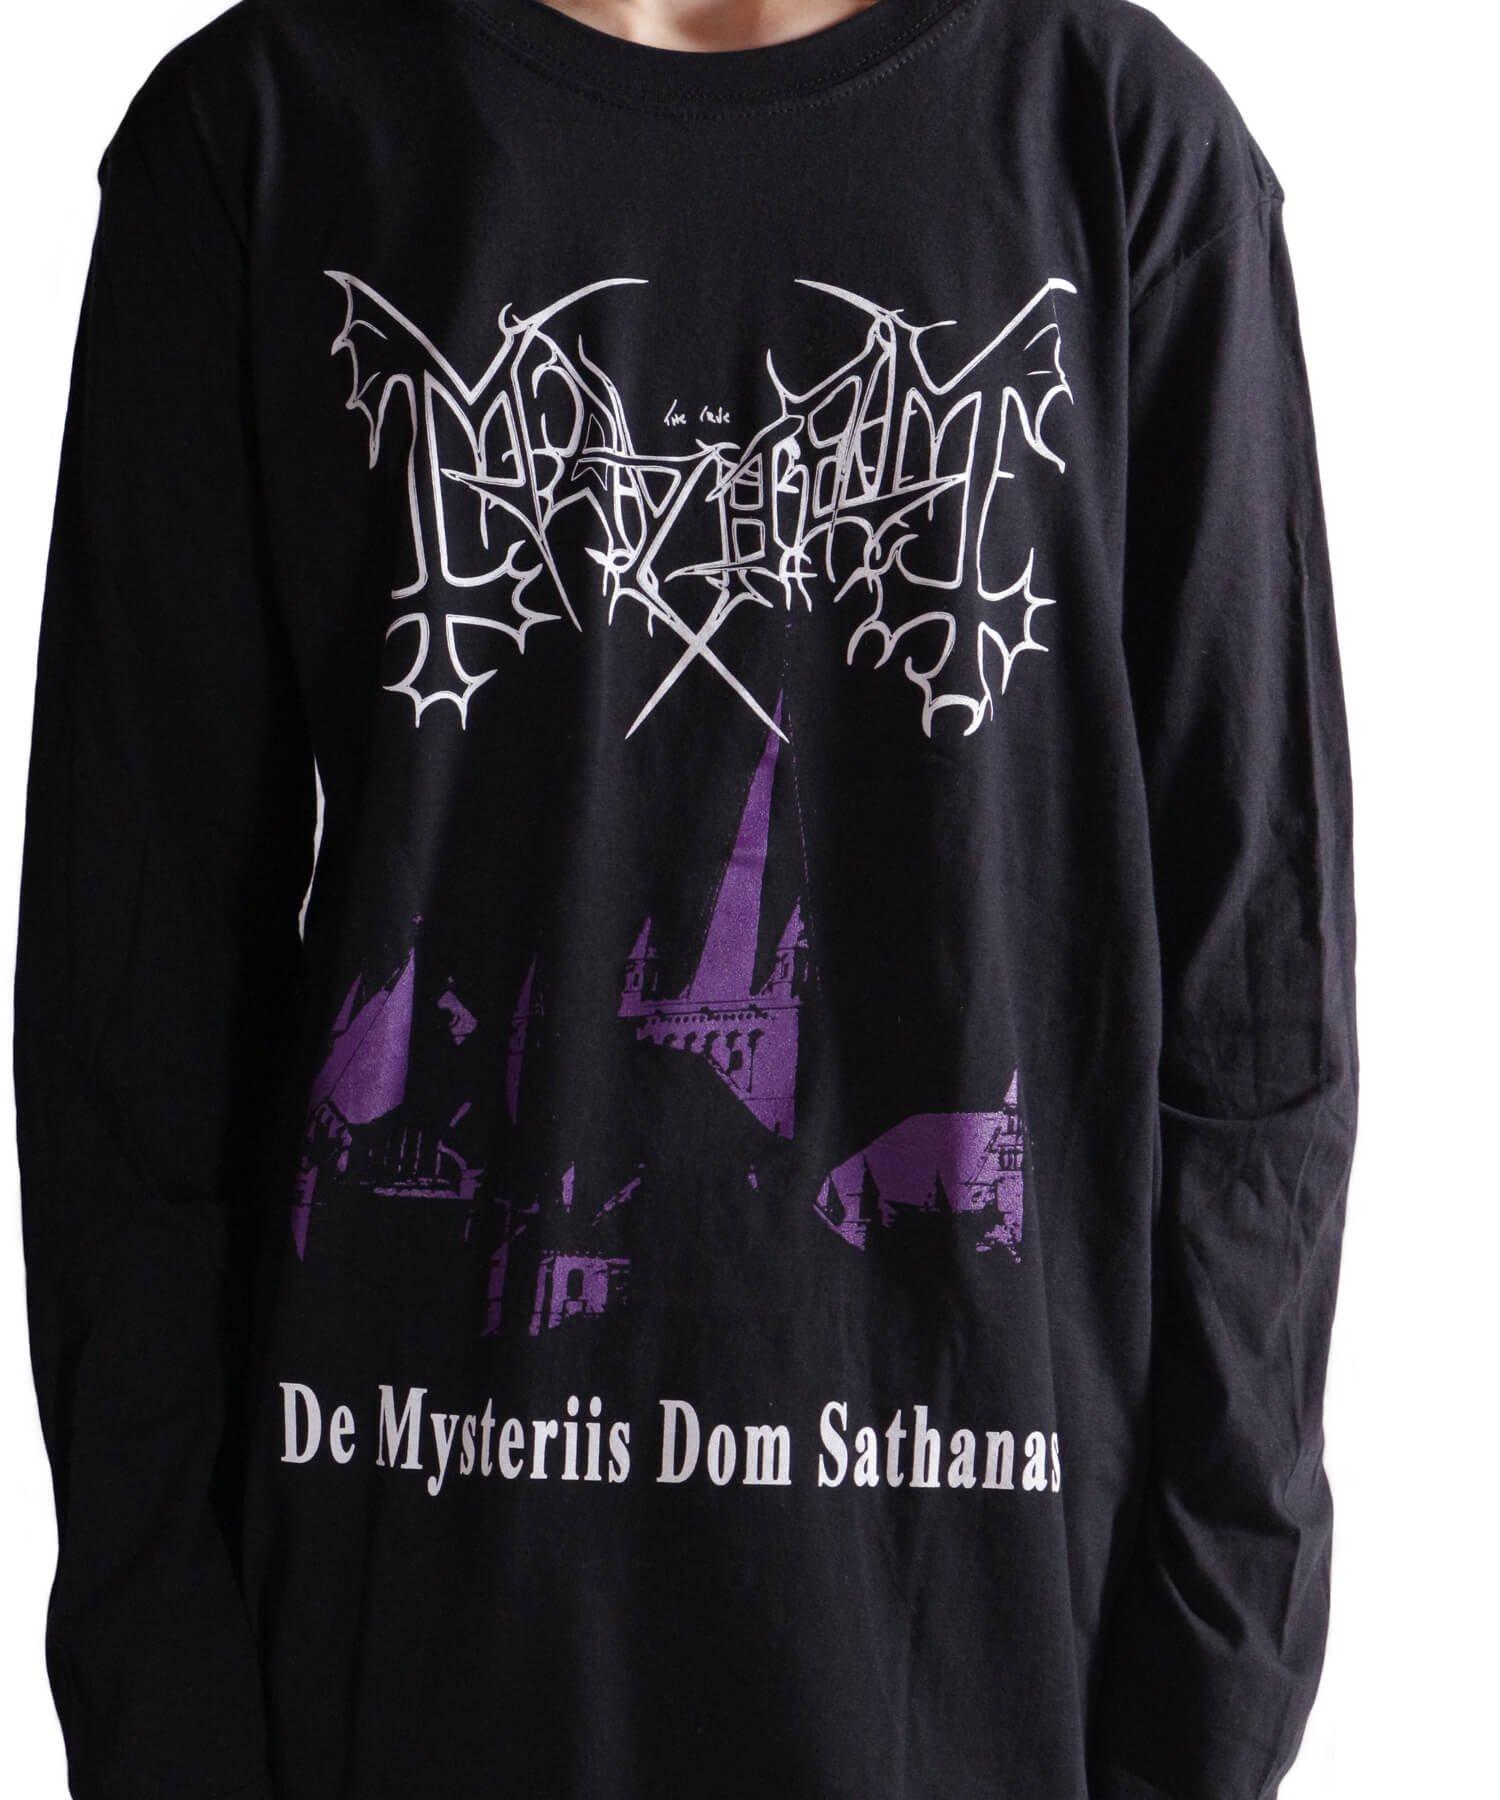 Official Artist Goods / バンドTなど |MAYHEM / メイヘム:DE MYSTERIIS DOM SATHANAS LONG SLEEVE SHIRT (BLACK) 商品画像21